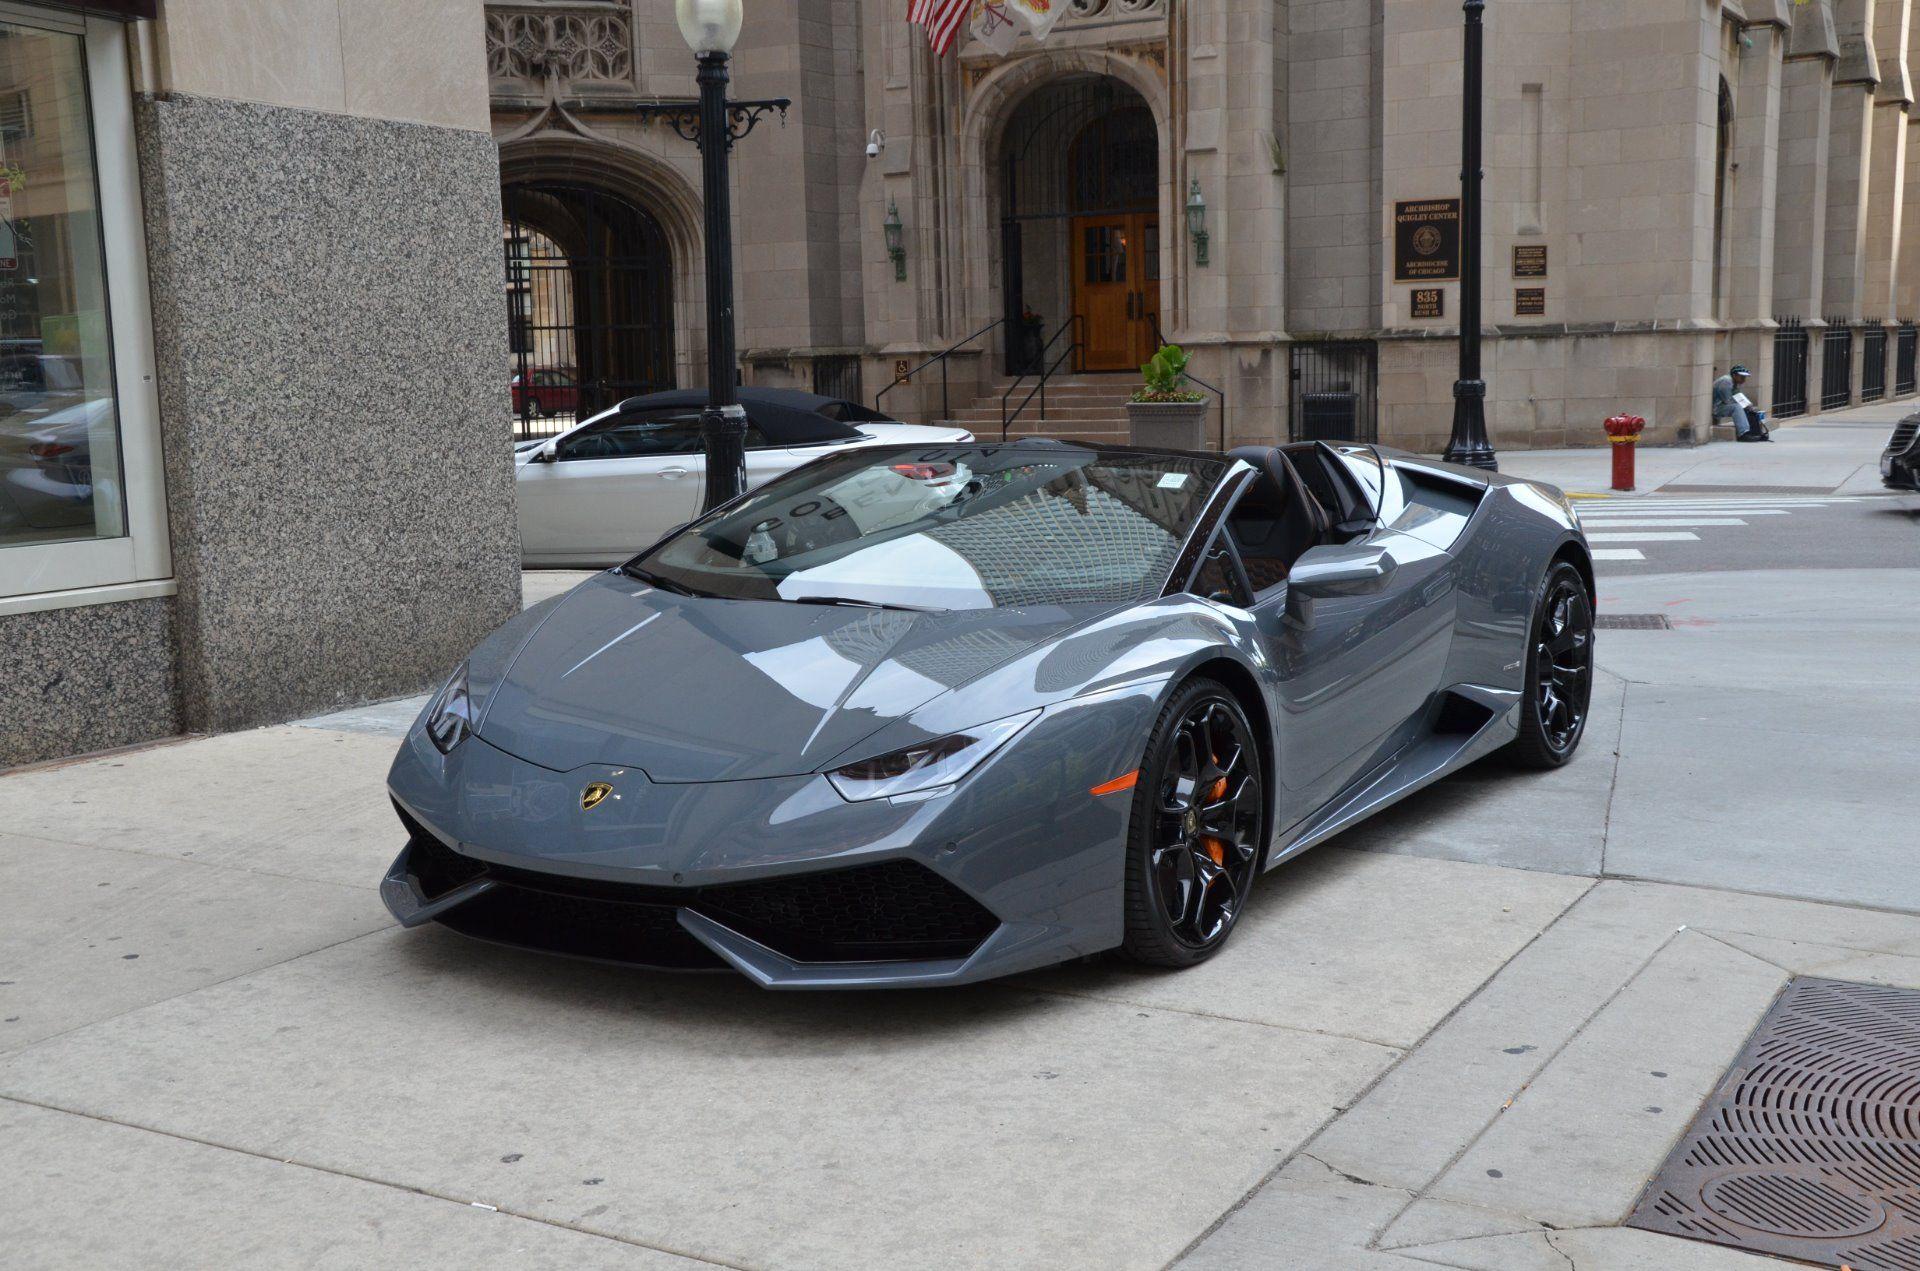 9ffa5d65732098d3f19e88fd03b9b2f5 Breathtaking Price Of Lamborghini Huracán Lp 610 4 Cars Trend